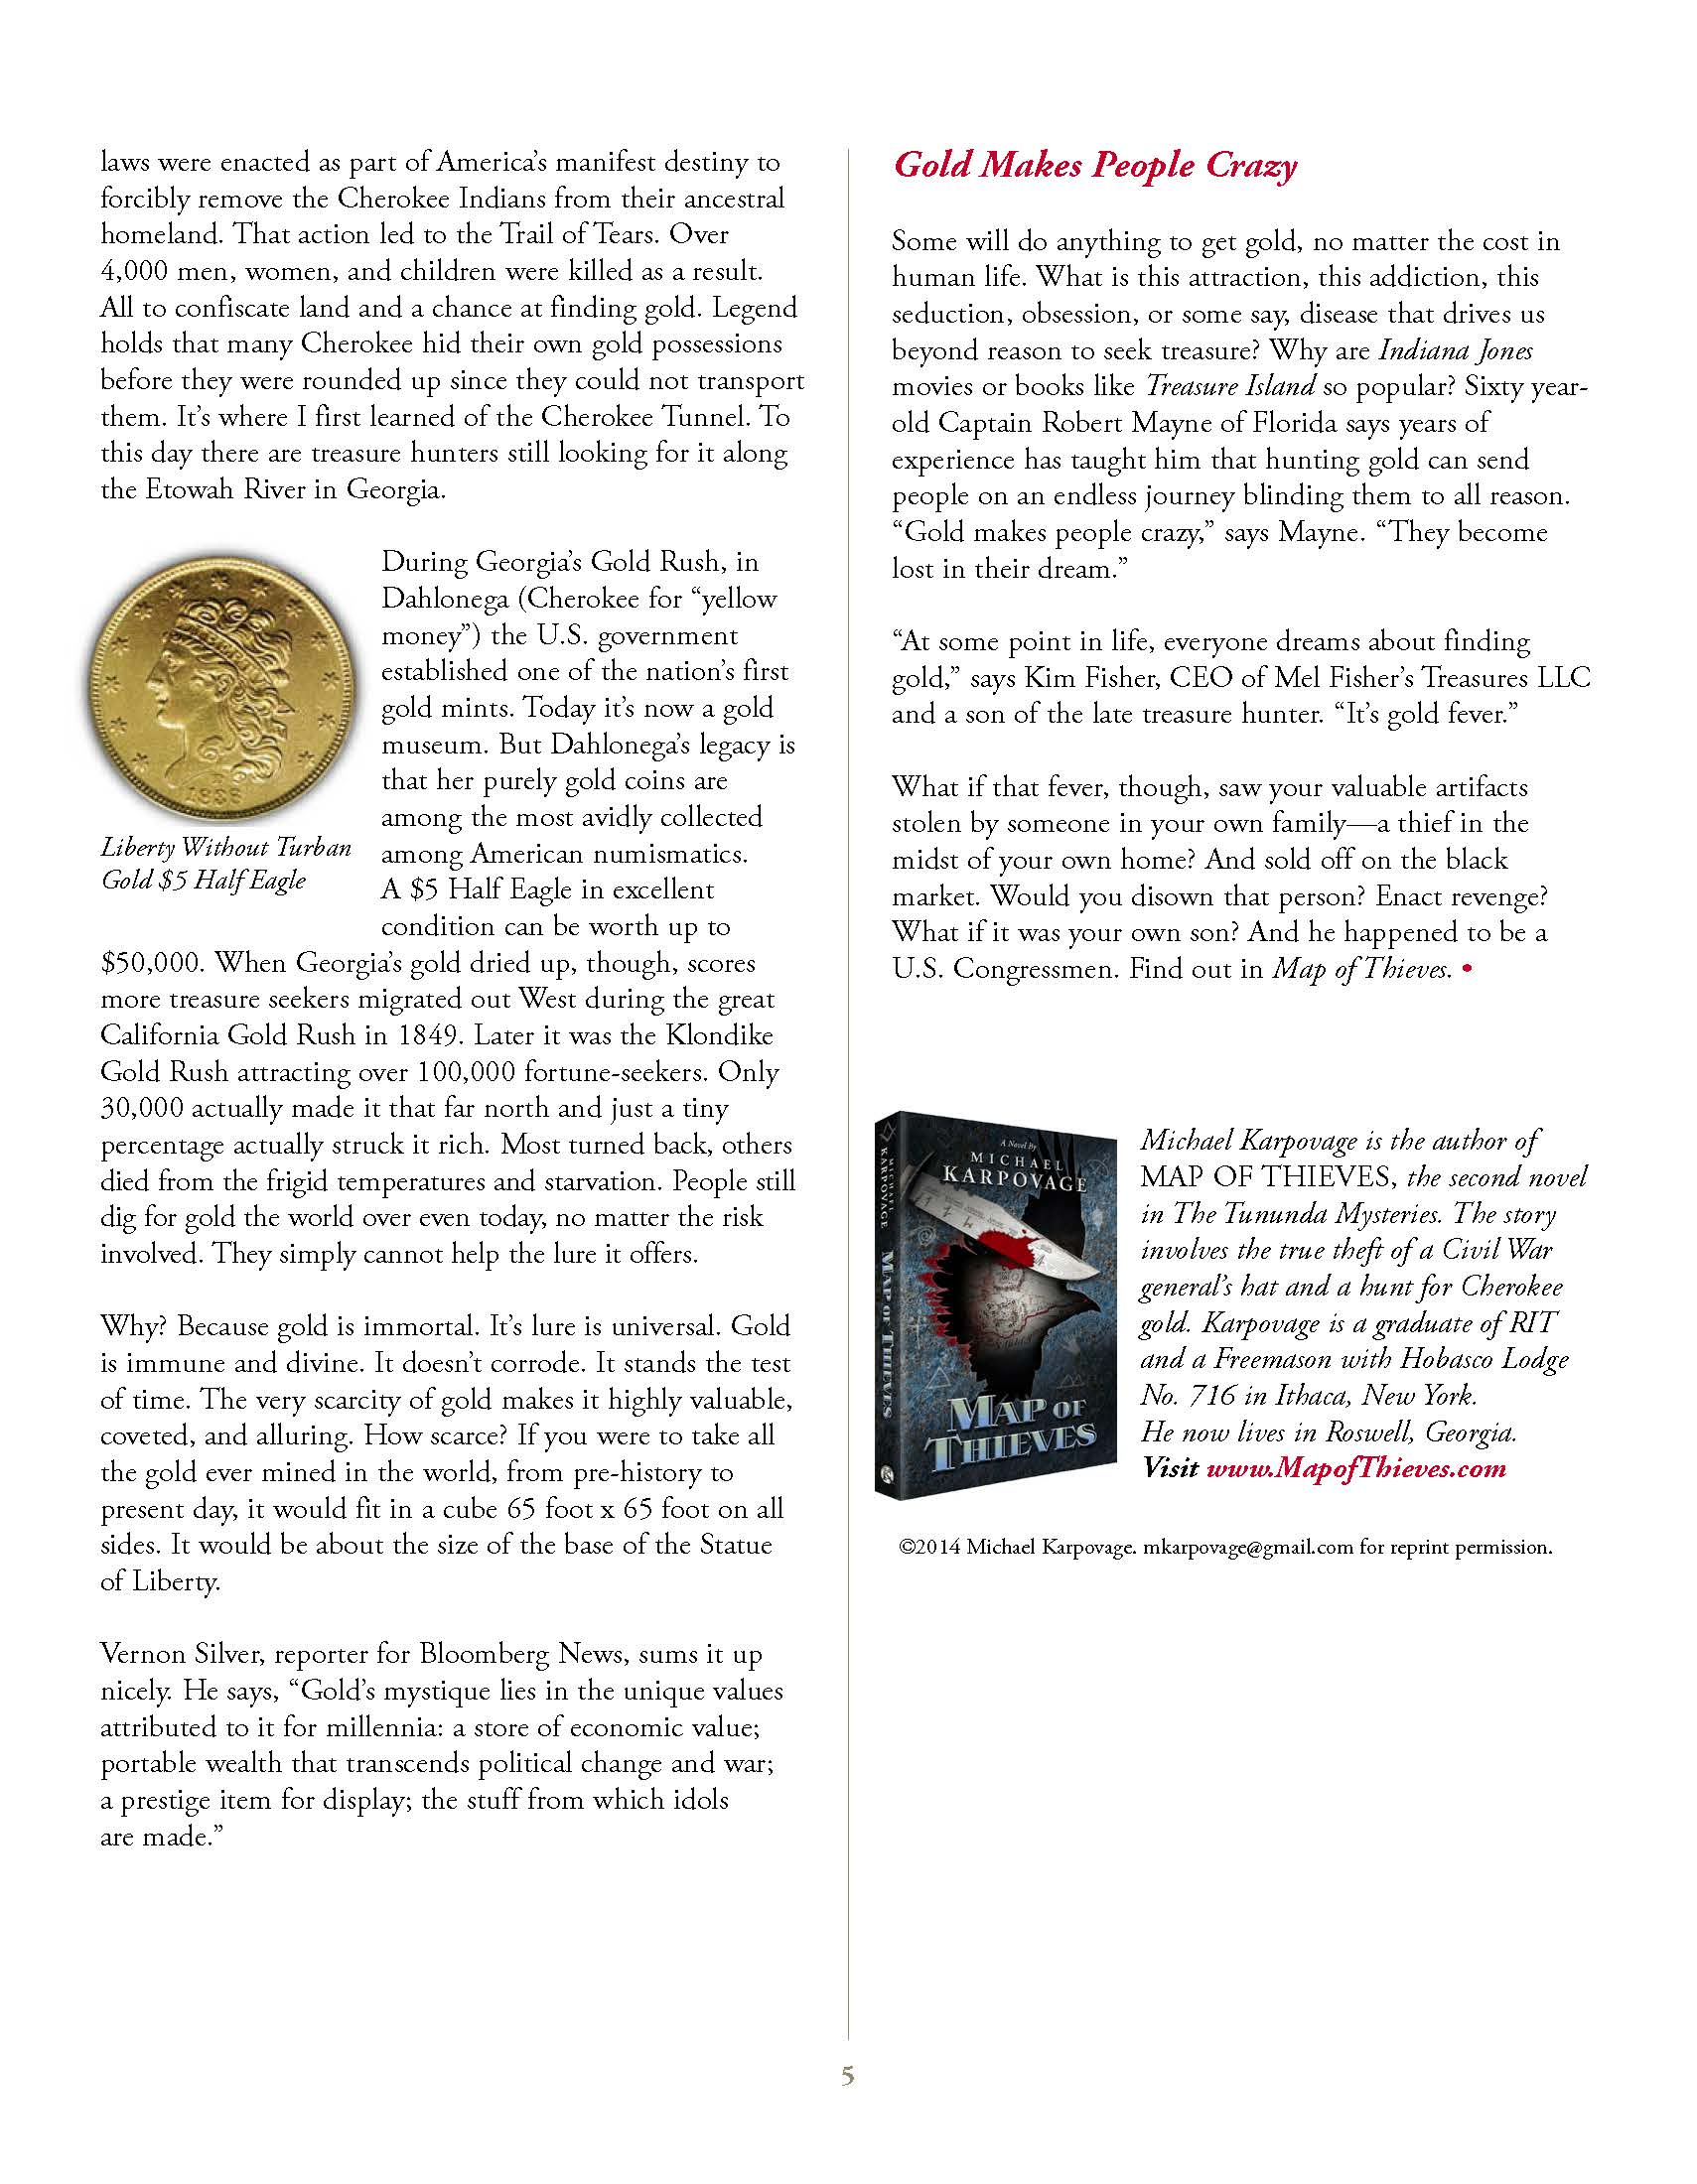 Finding-Treasure-article_Page_5.jpg